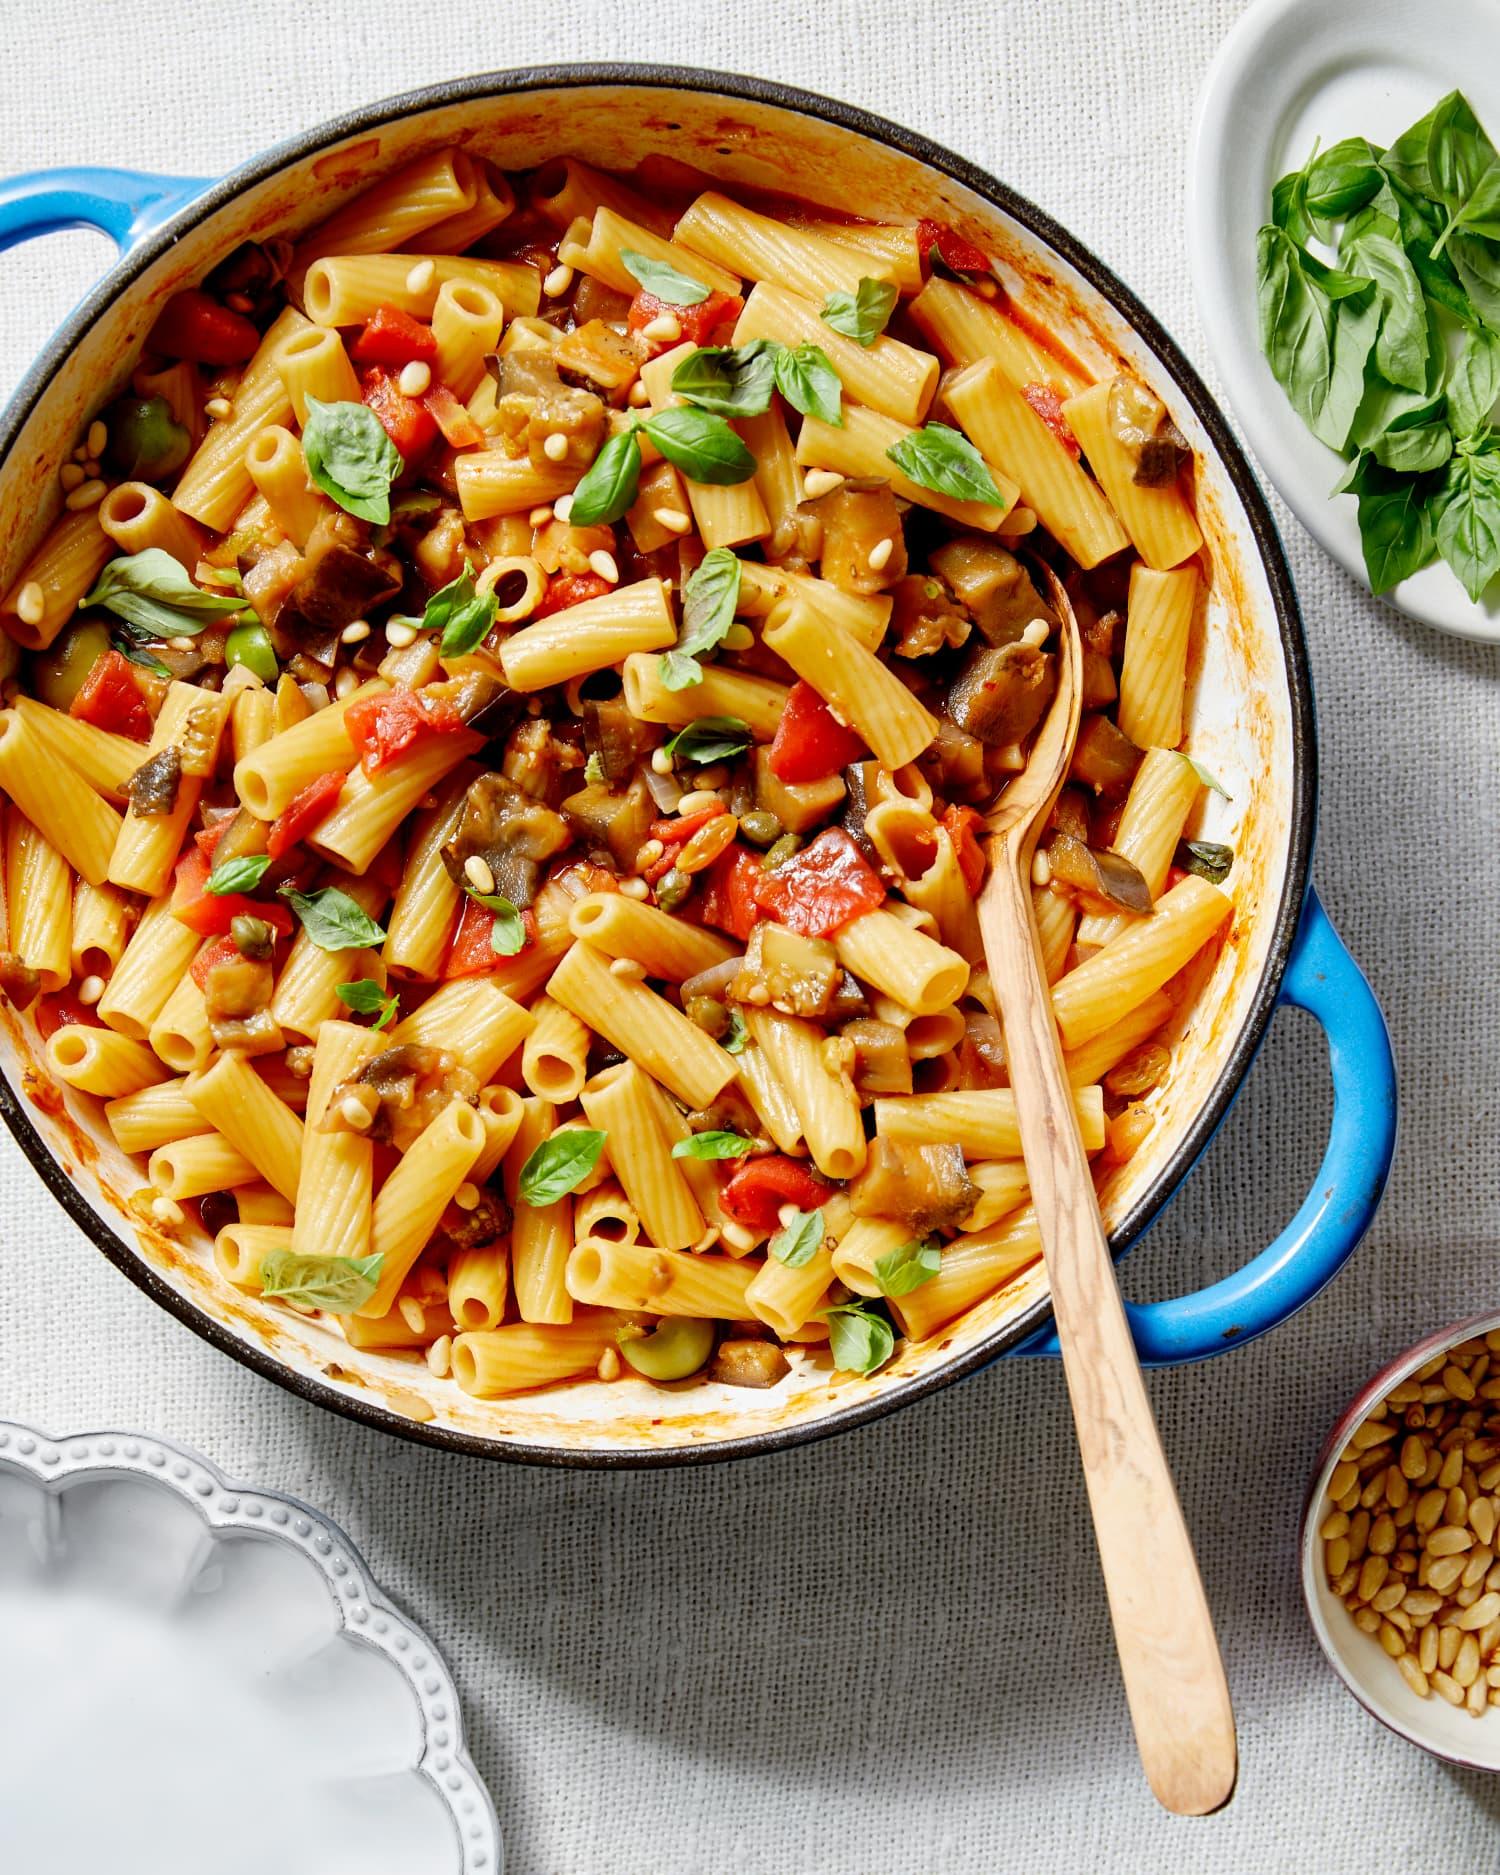 One-Pot Eggplant Caponata Pasta Will Transport You to Sicily